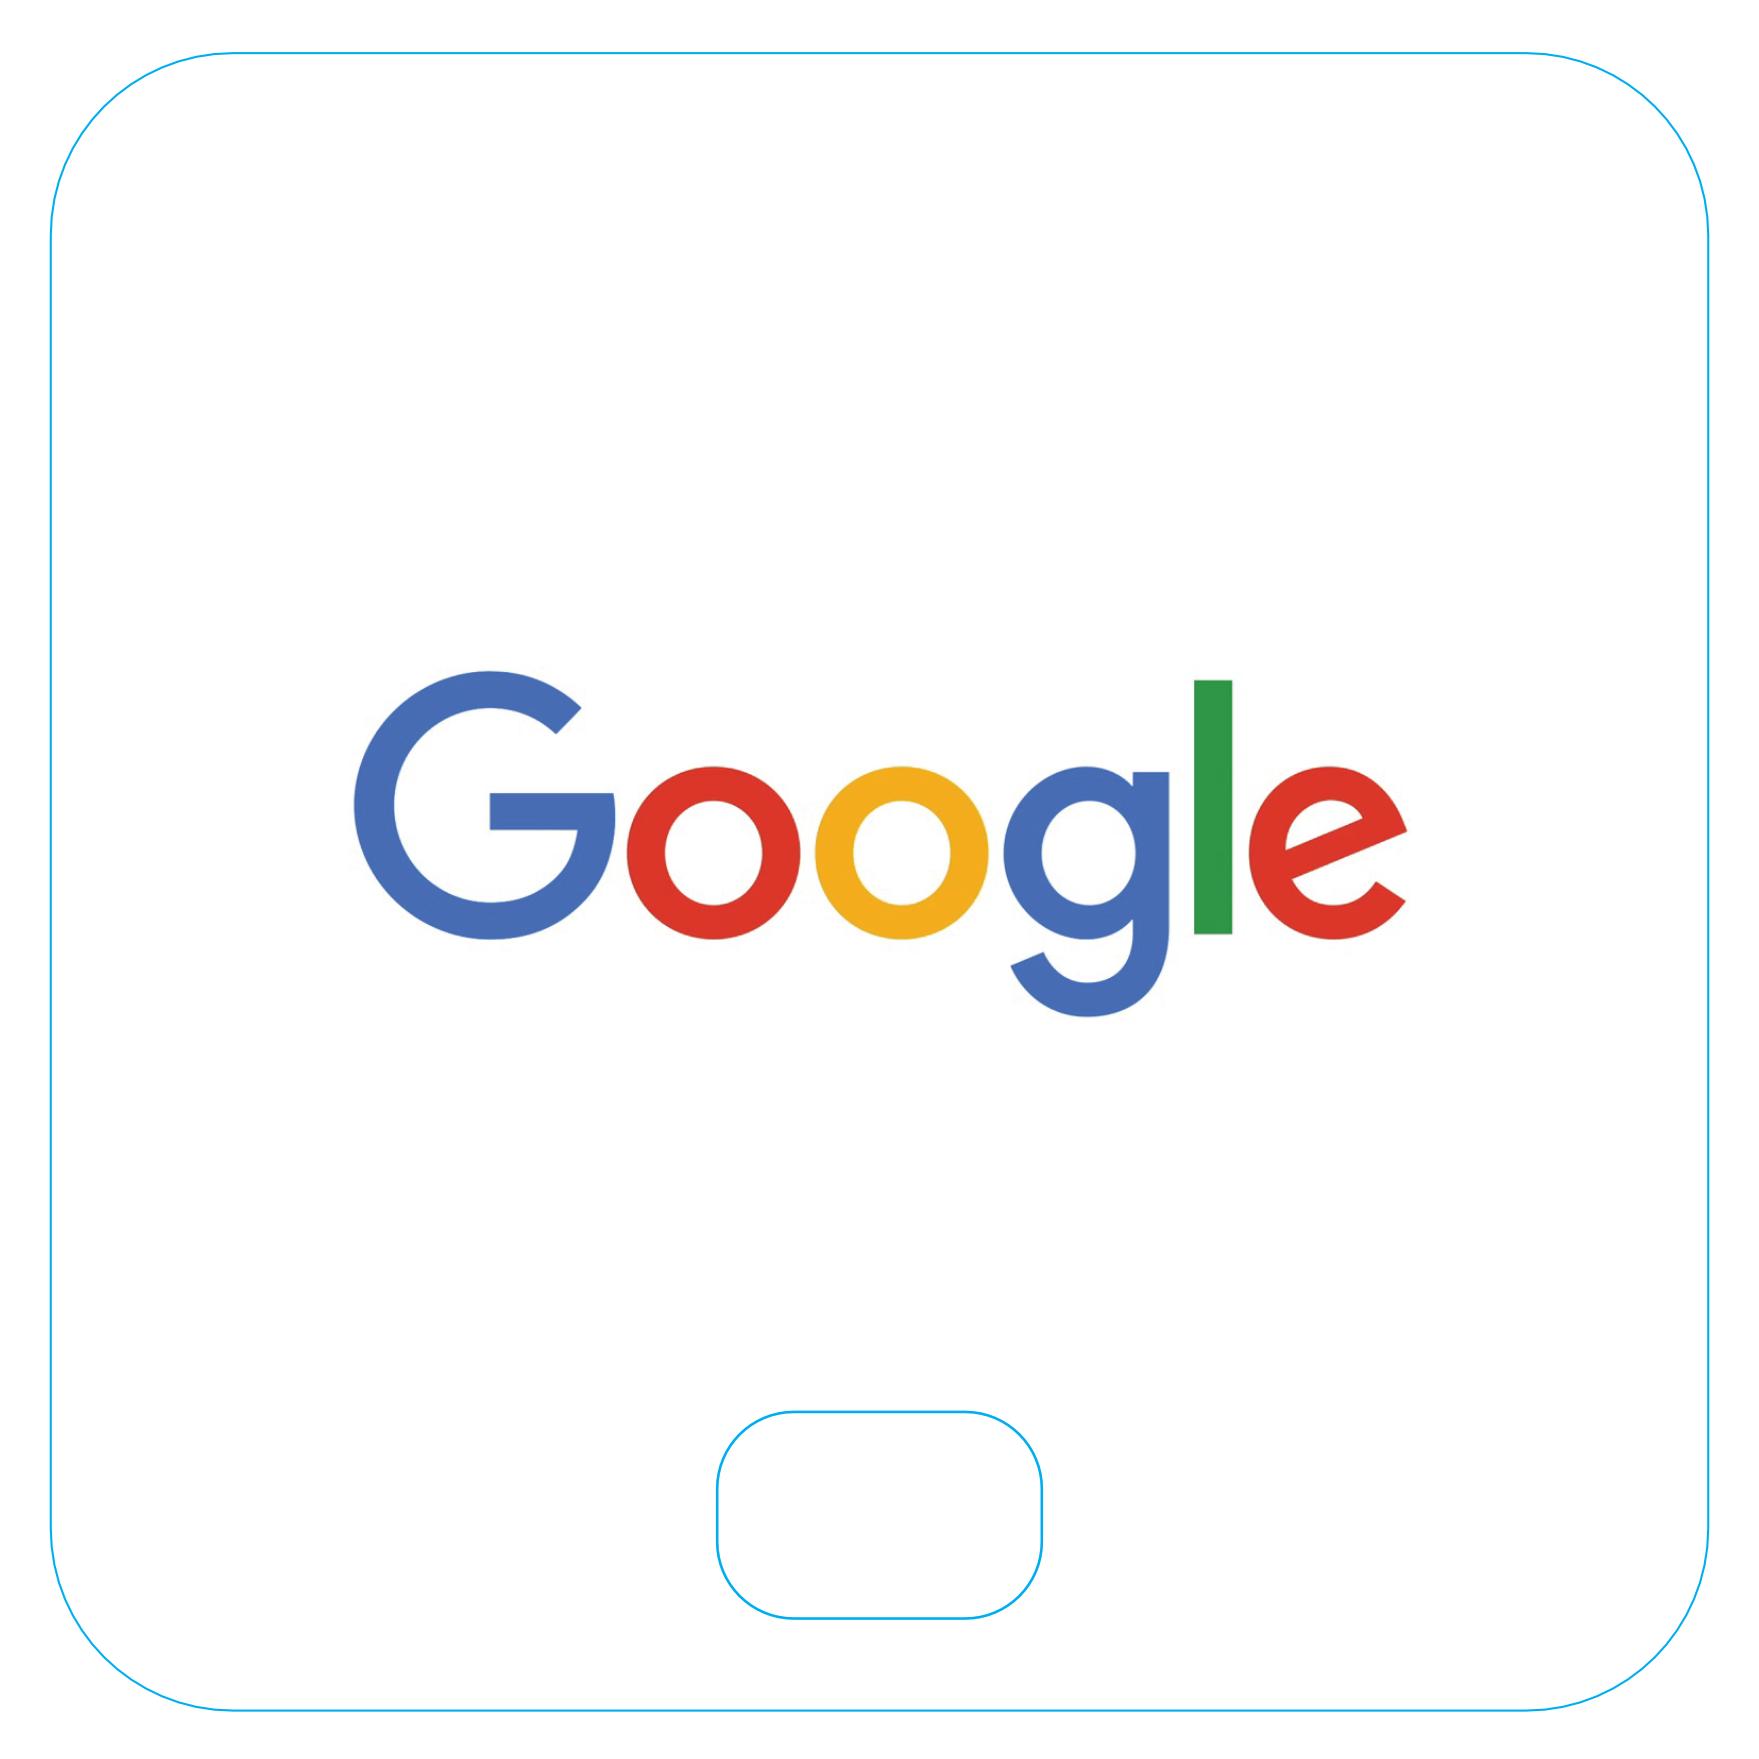 Google 70.2 x 70.2